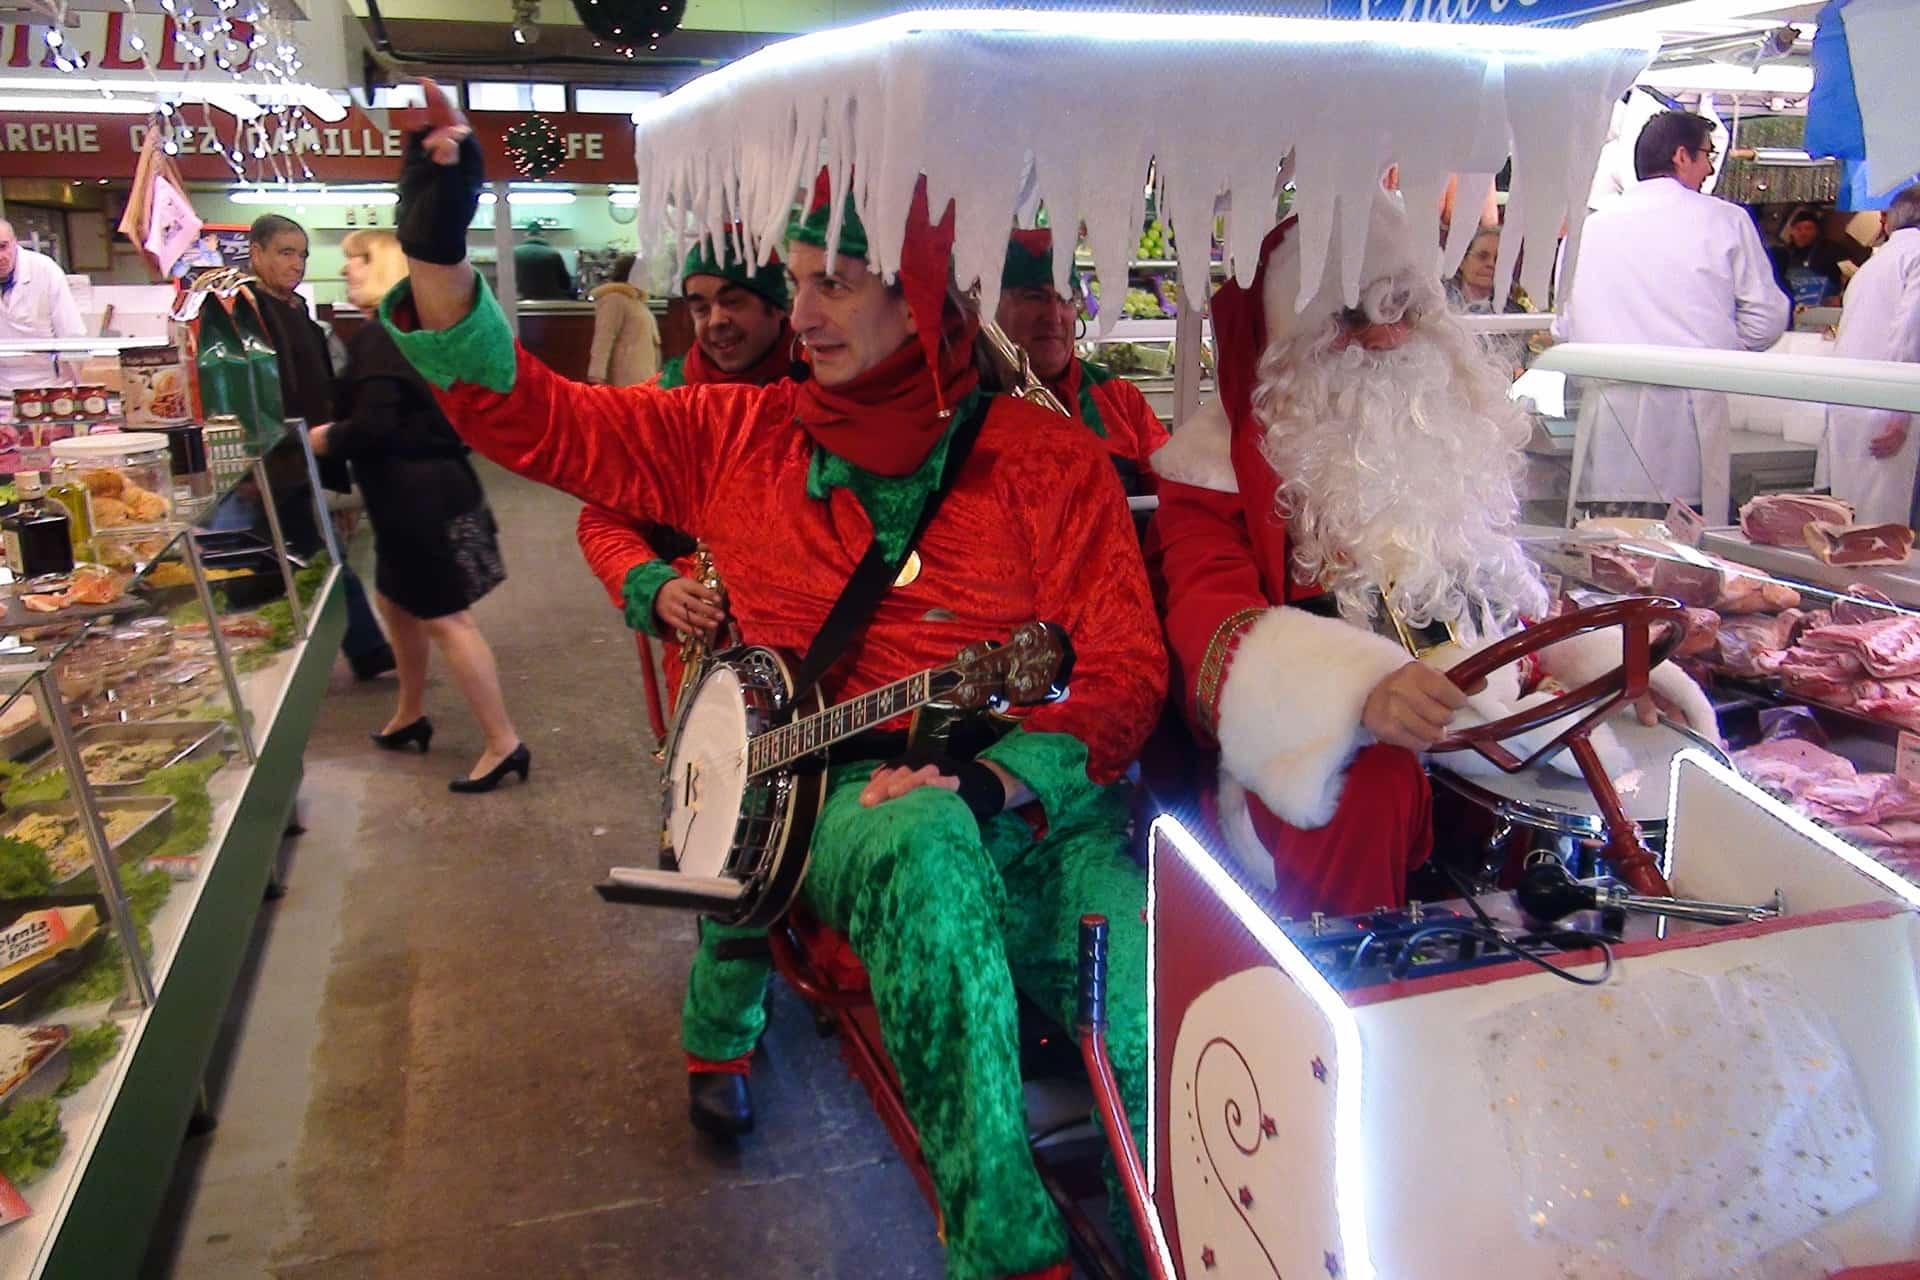 La loco musicale du père Noël > Noël Noël